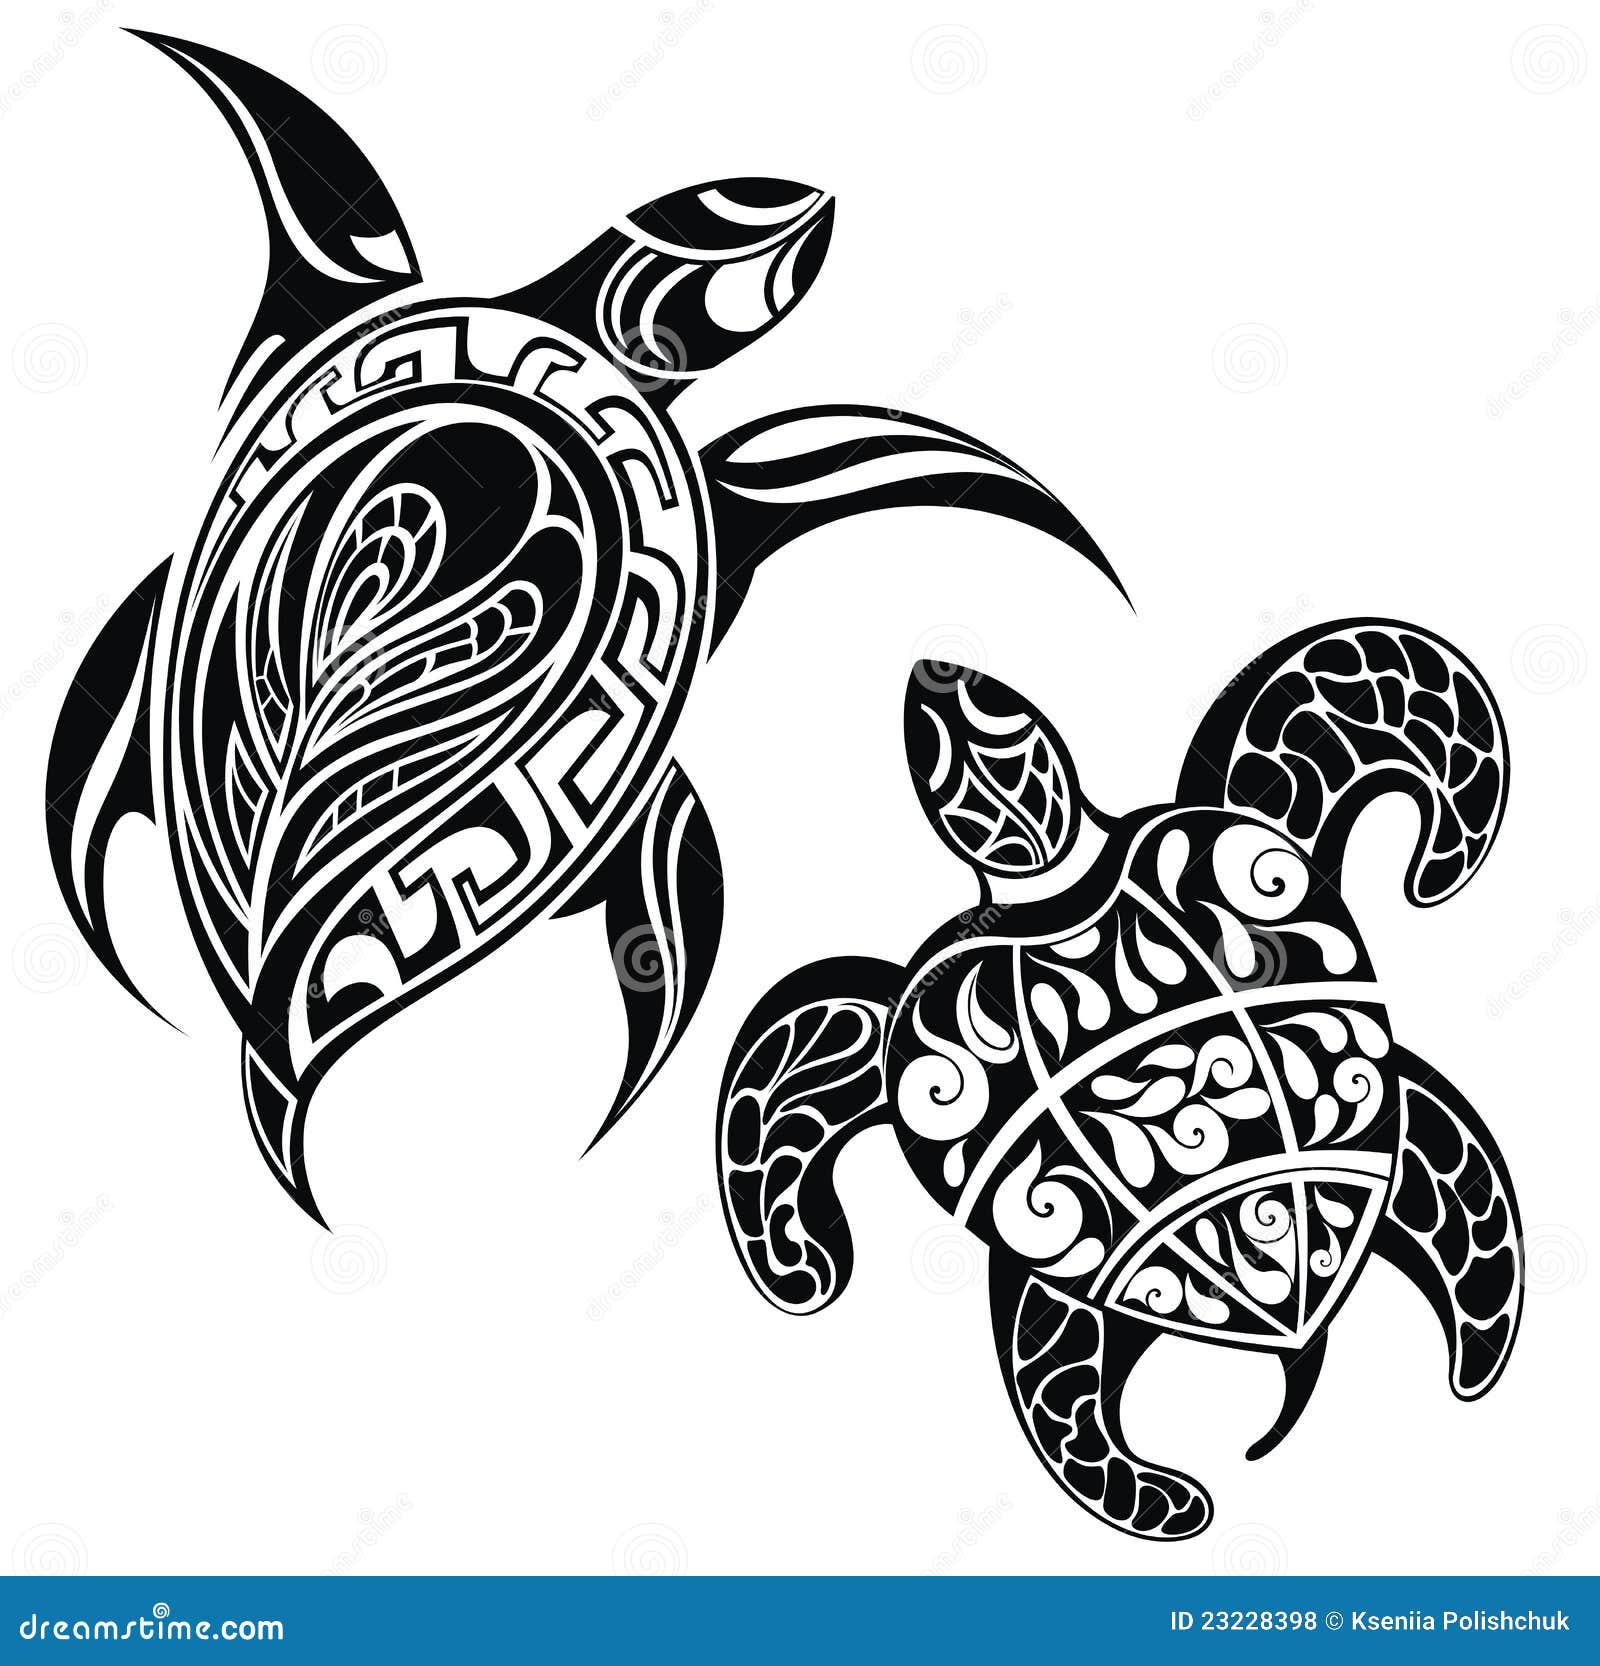 Hawaiian Tribal Tattoos Drawings